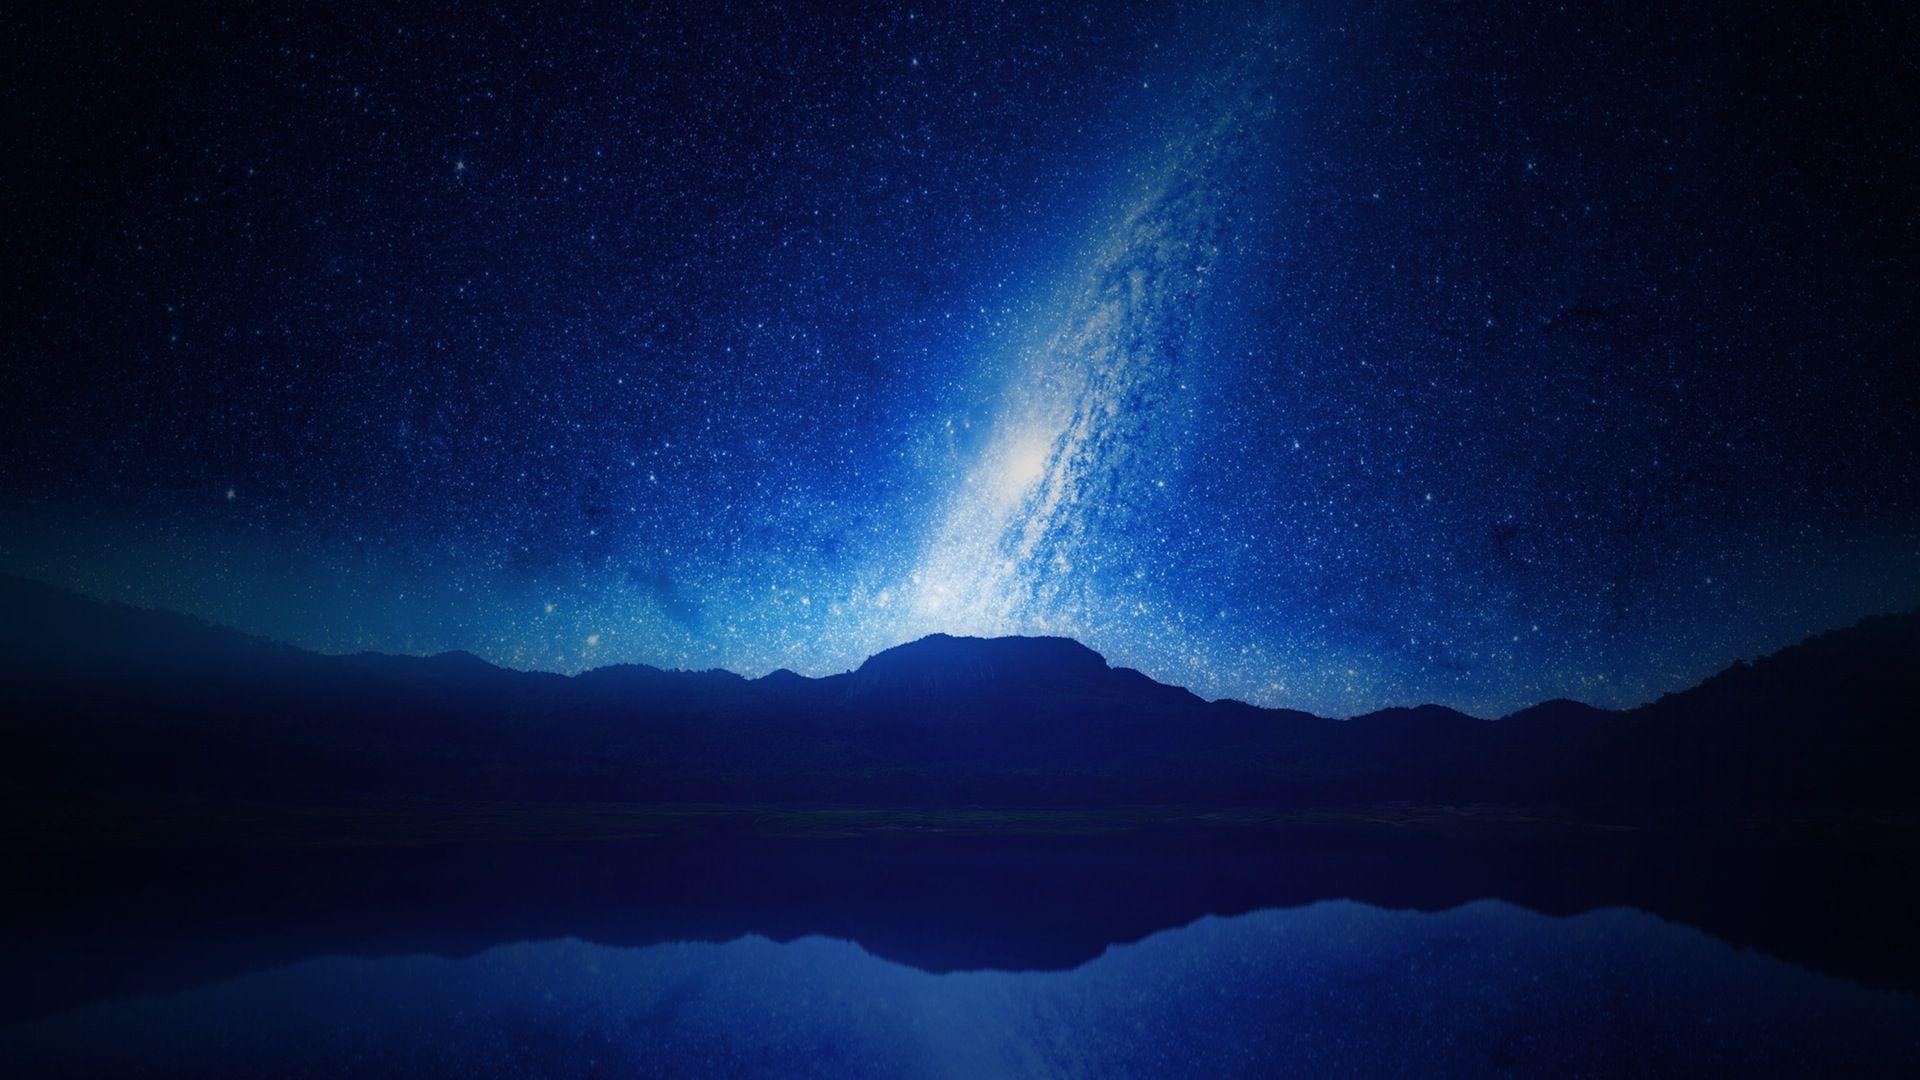 cielo, nocturna, estrellas, montañas, firmamento, galaxia, vía láctea - Fondos de Pantalla HD - professor-falken.com